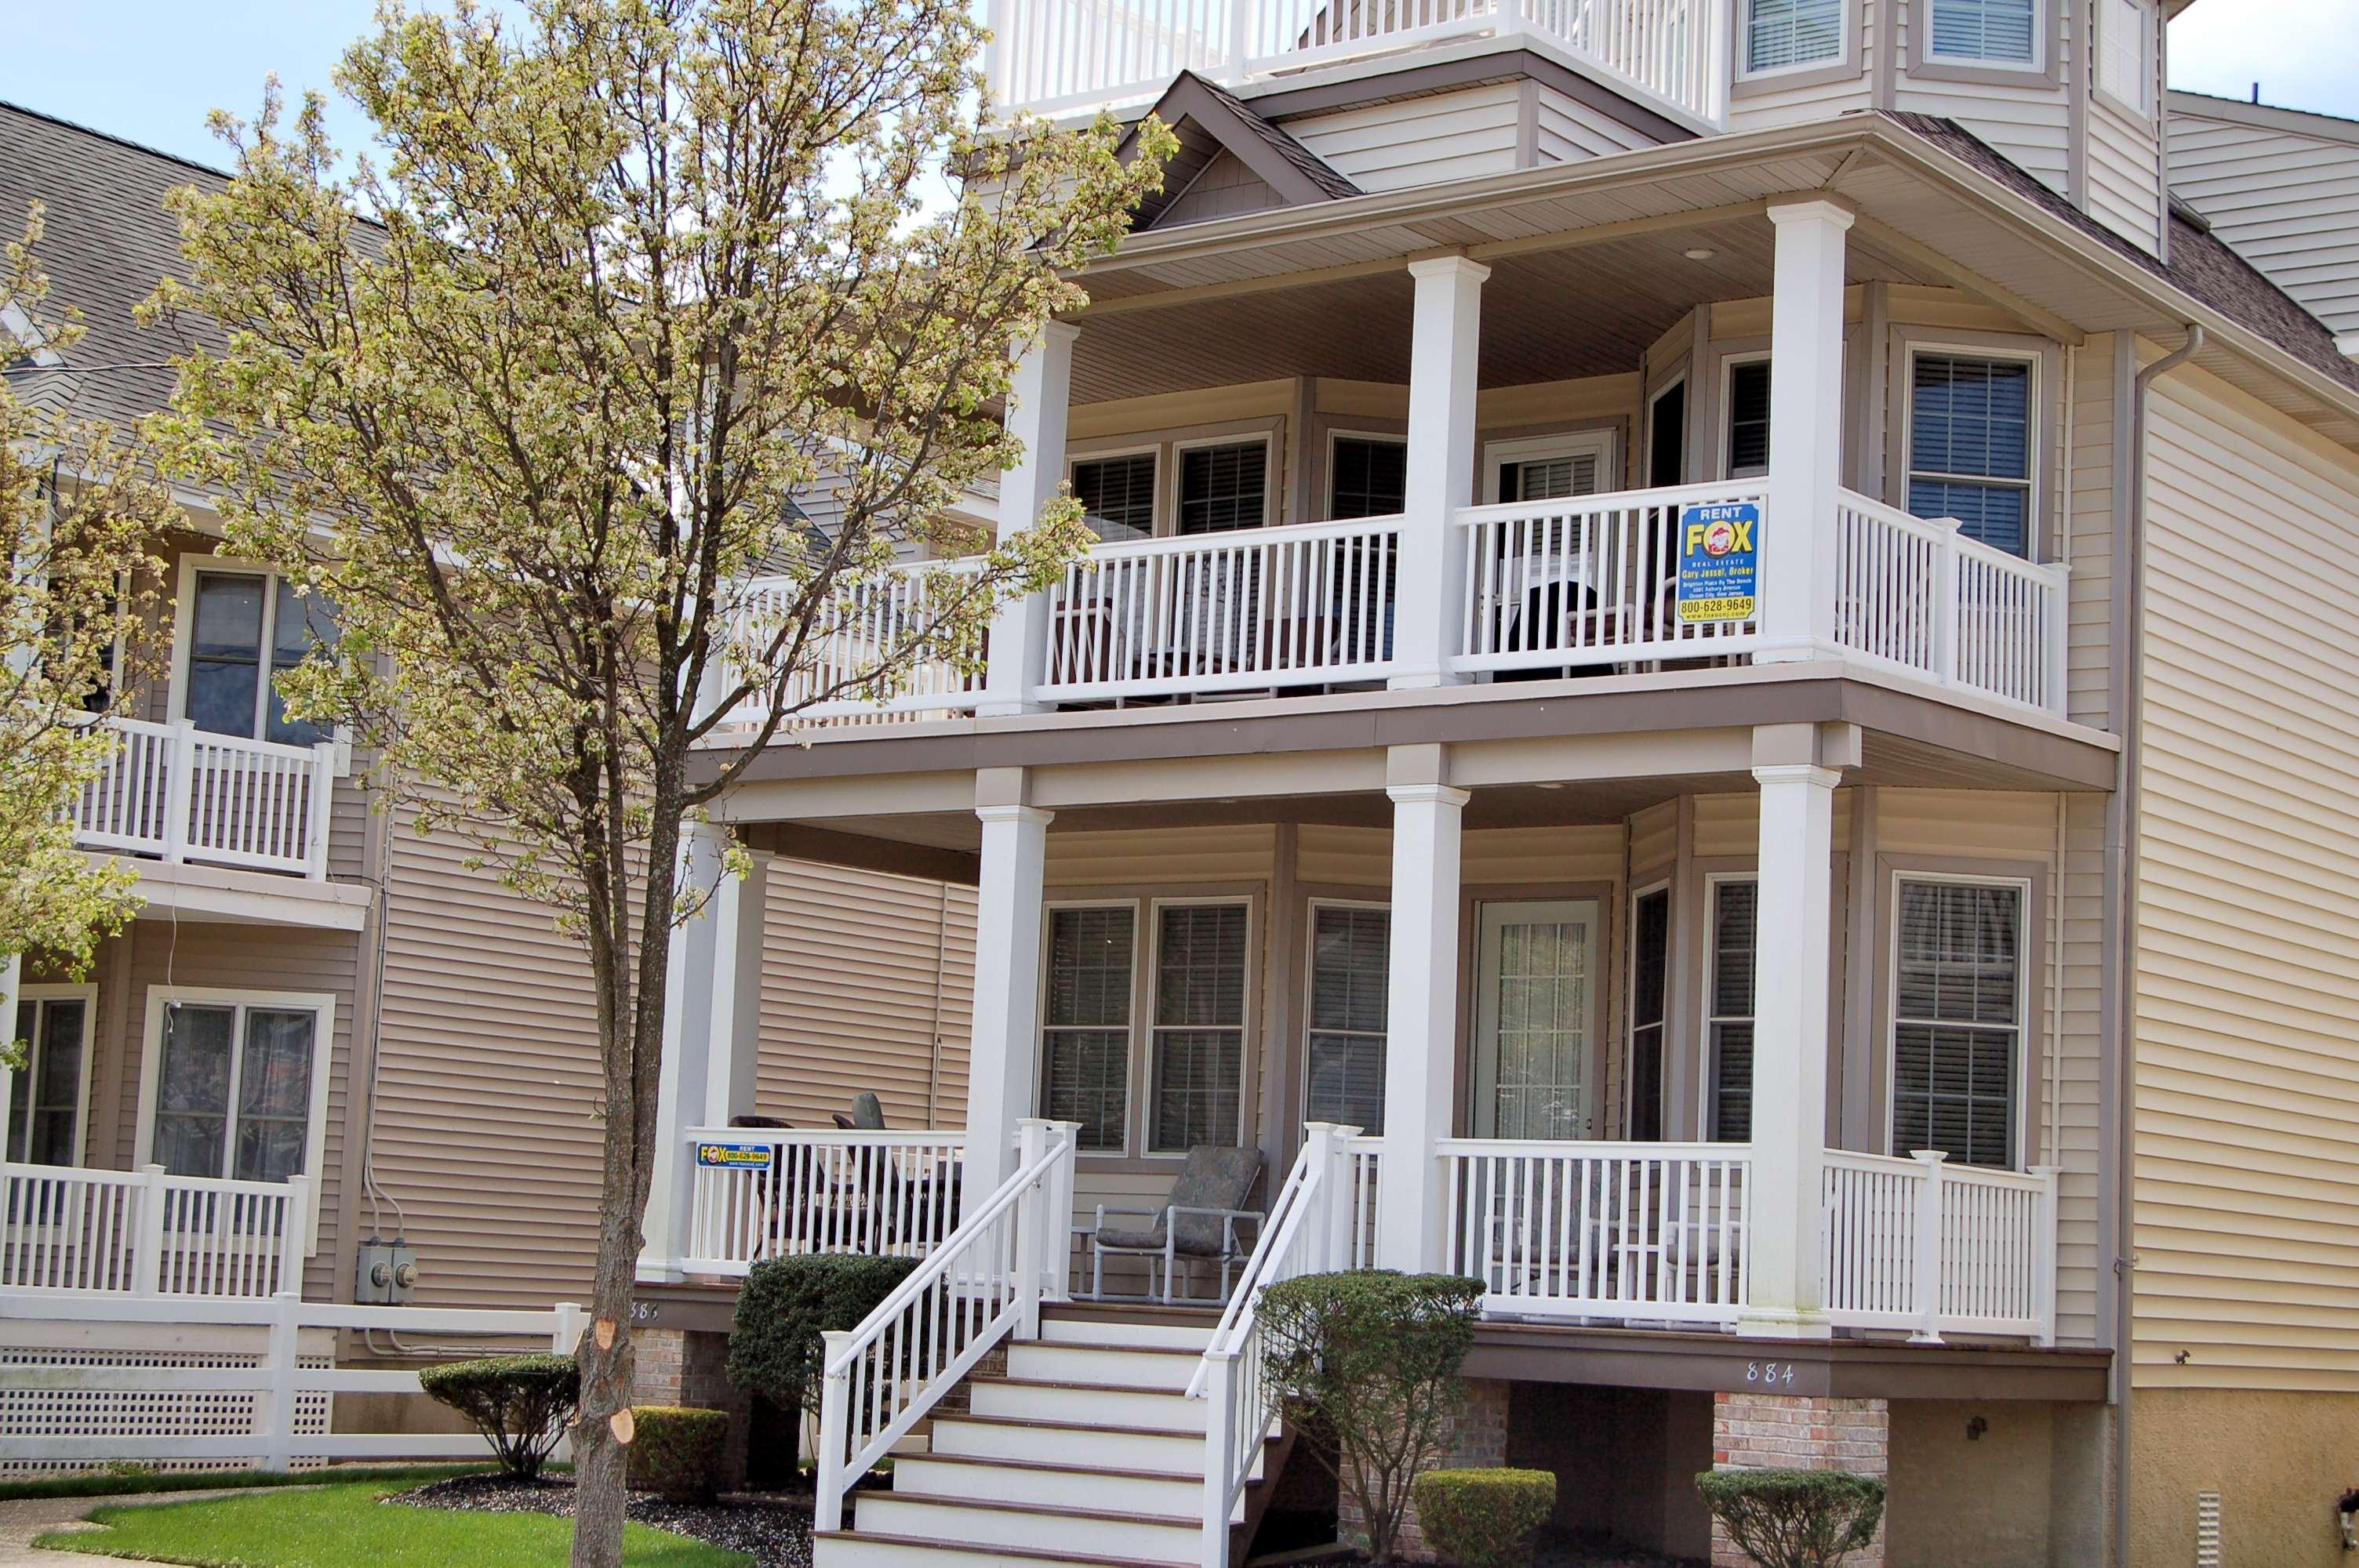 Condomínio para Venda às 884 Park Place 884 Park Place 1st Floor Ocean City, Nova Jersey, 08226 Estados Unidos